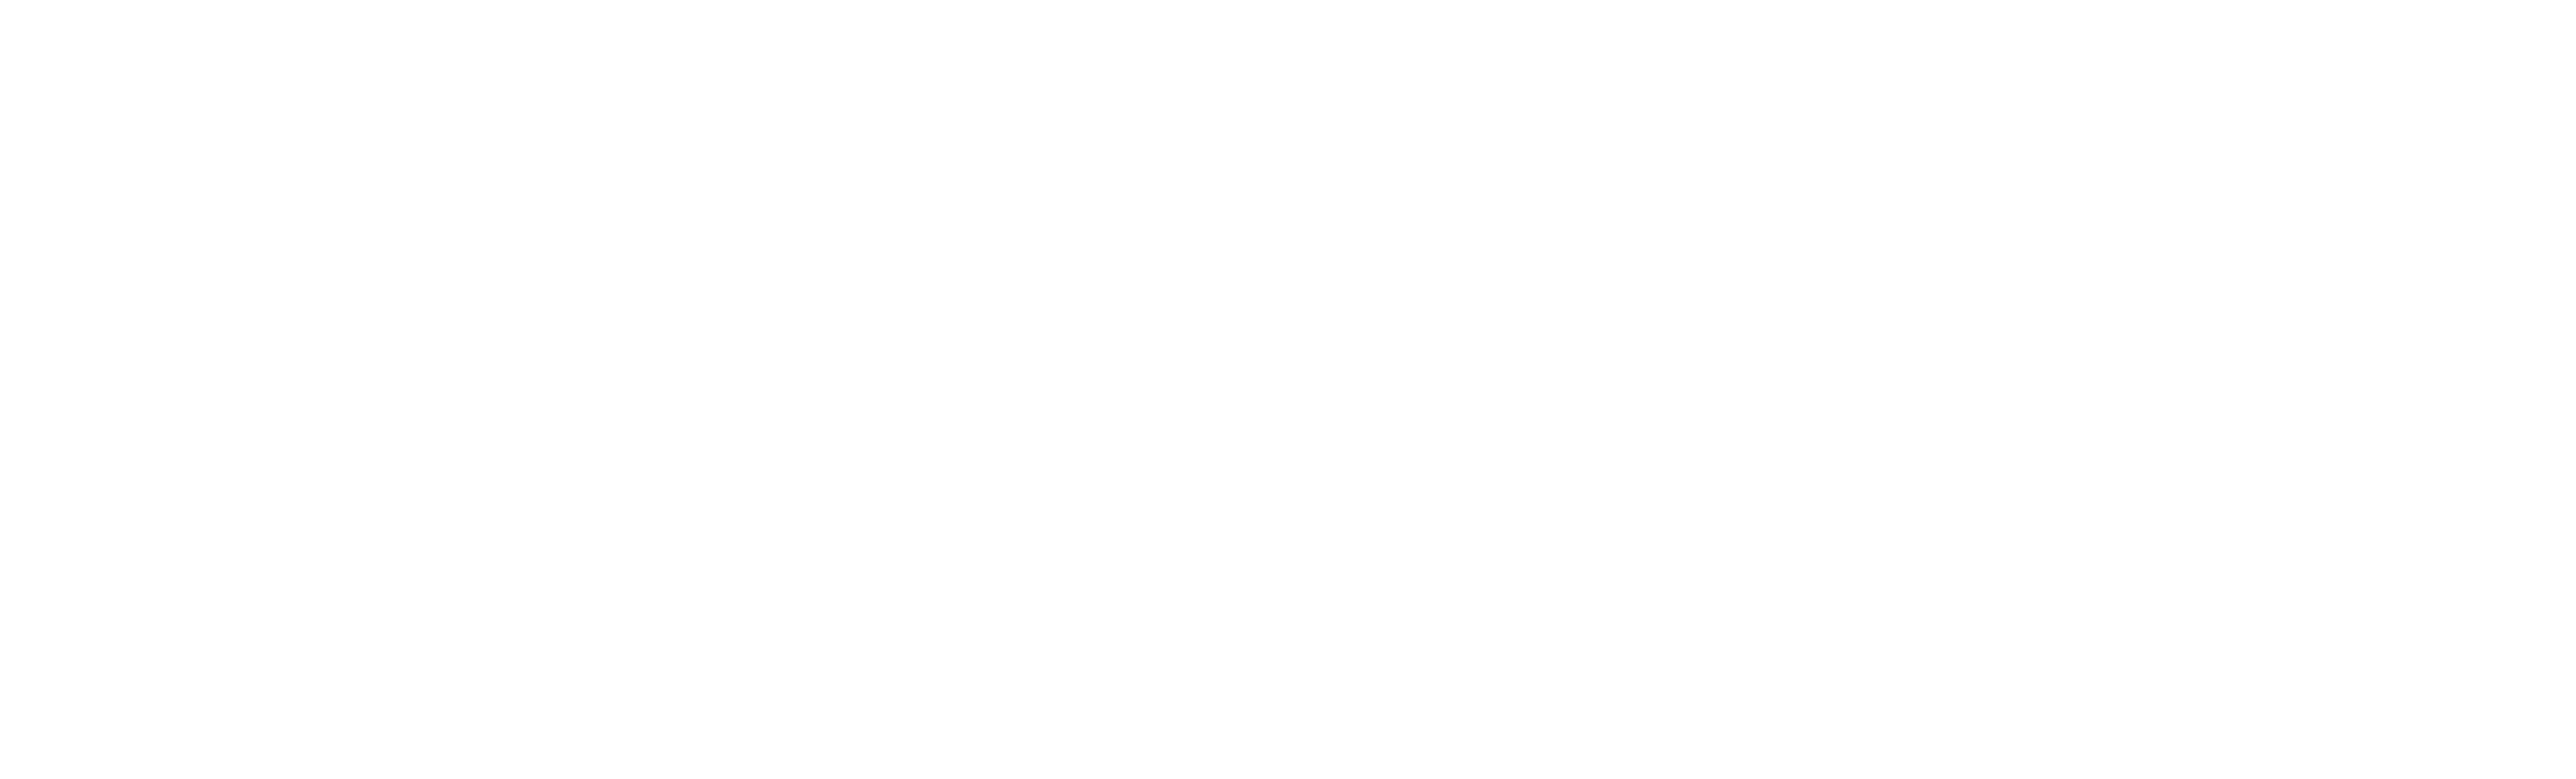 Truenorthaum Metrologie Systems